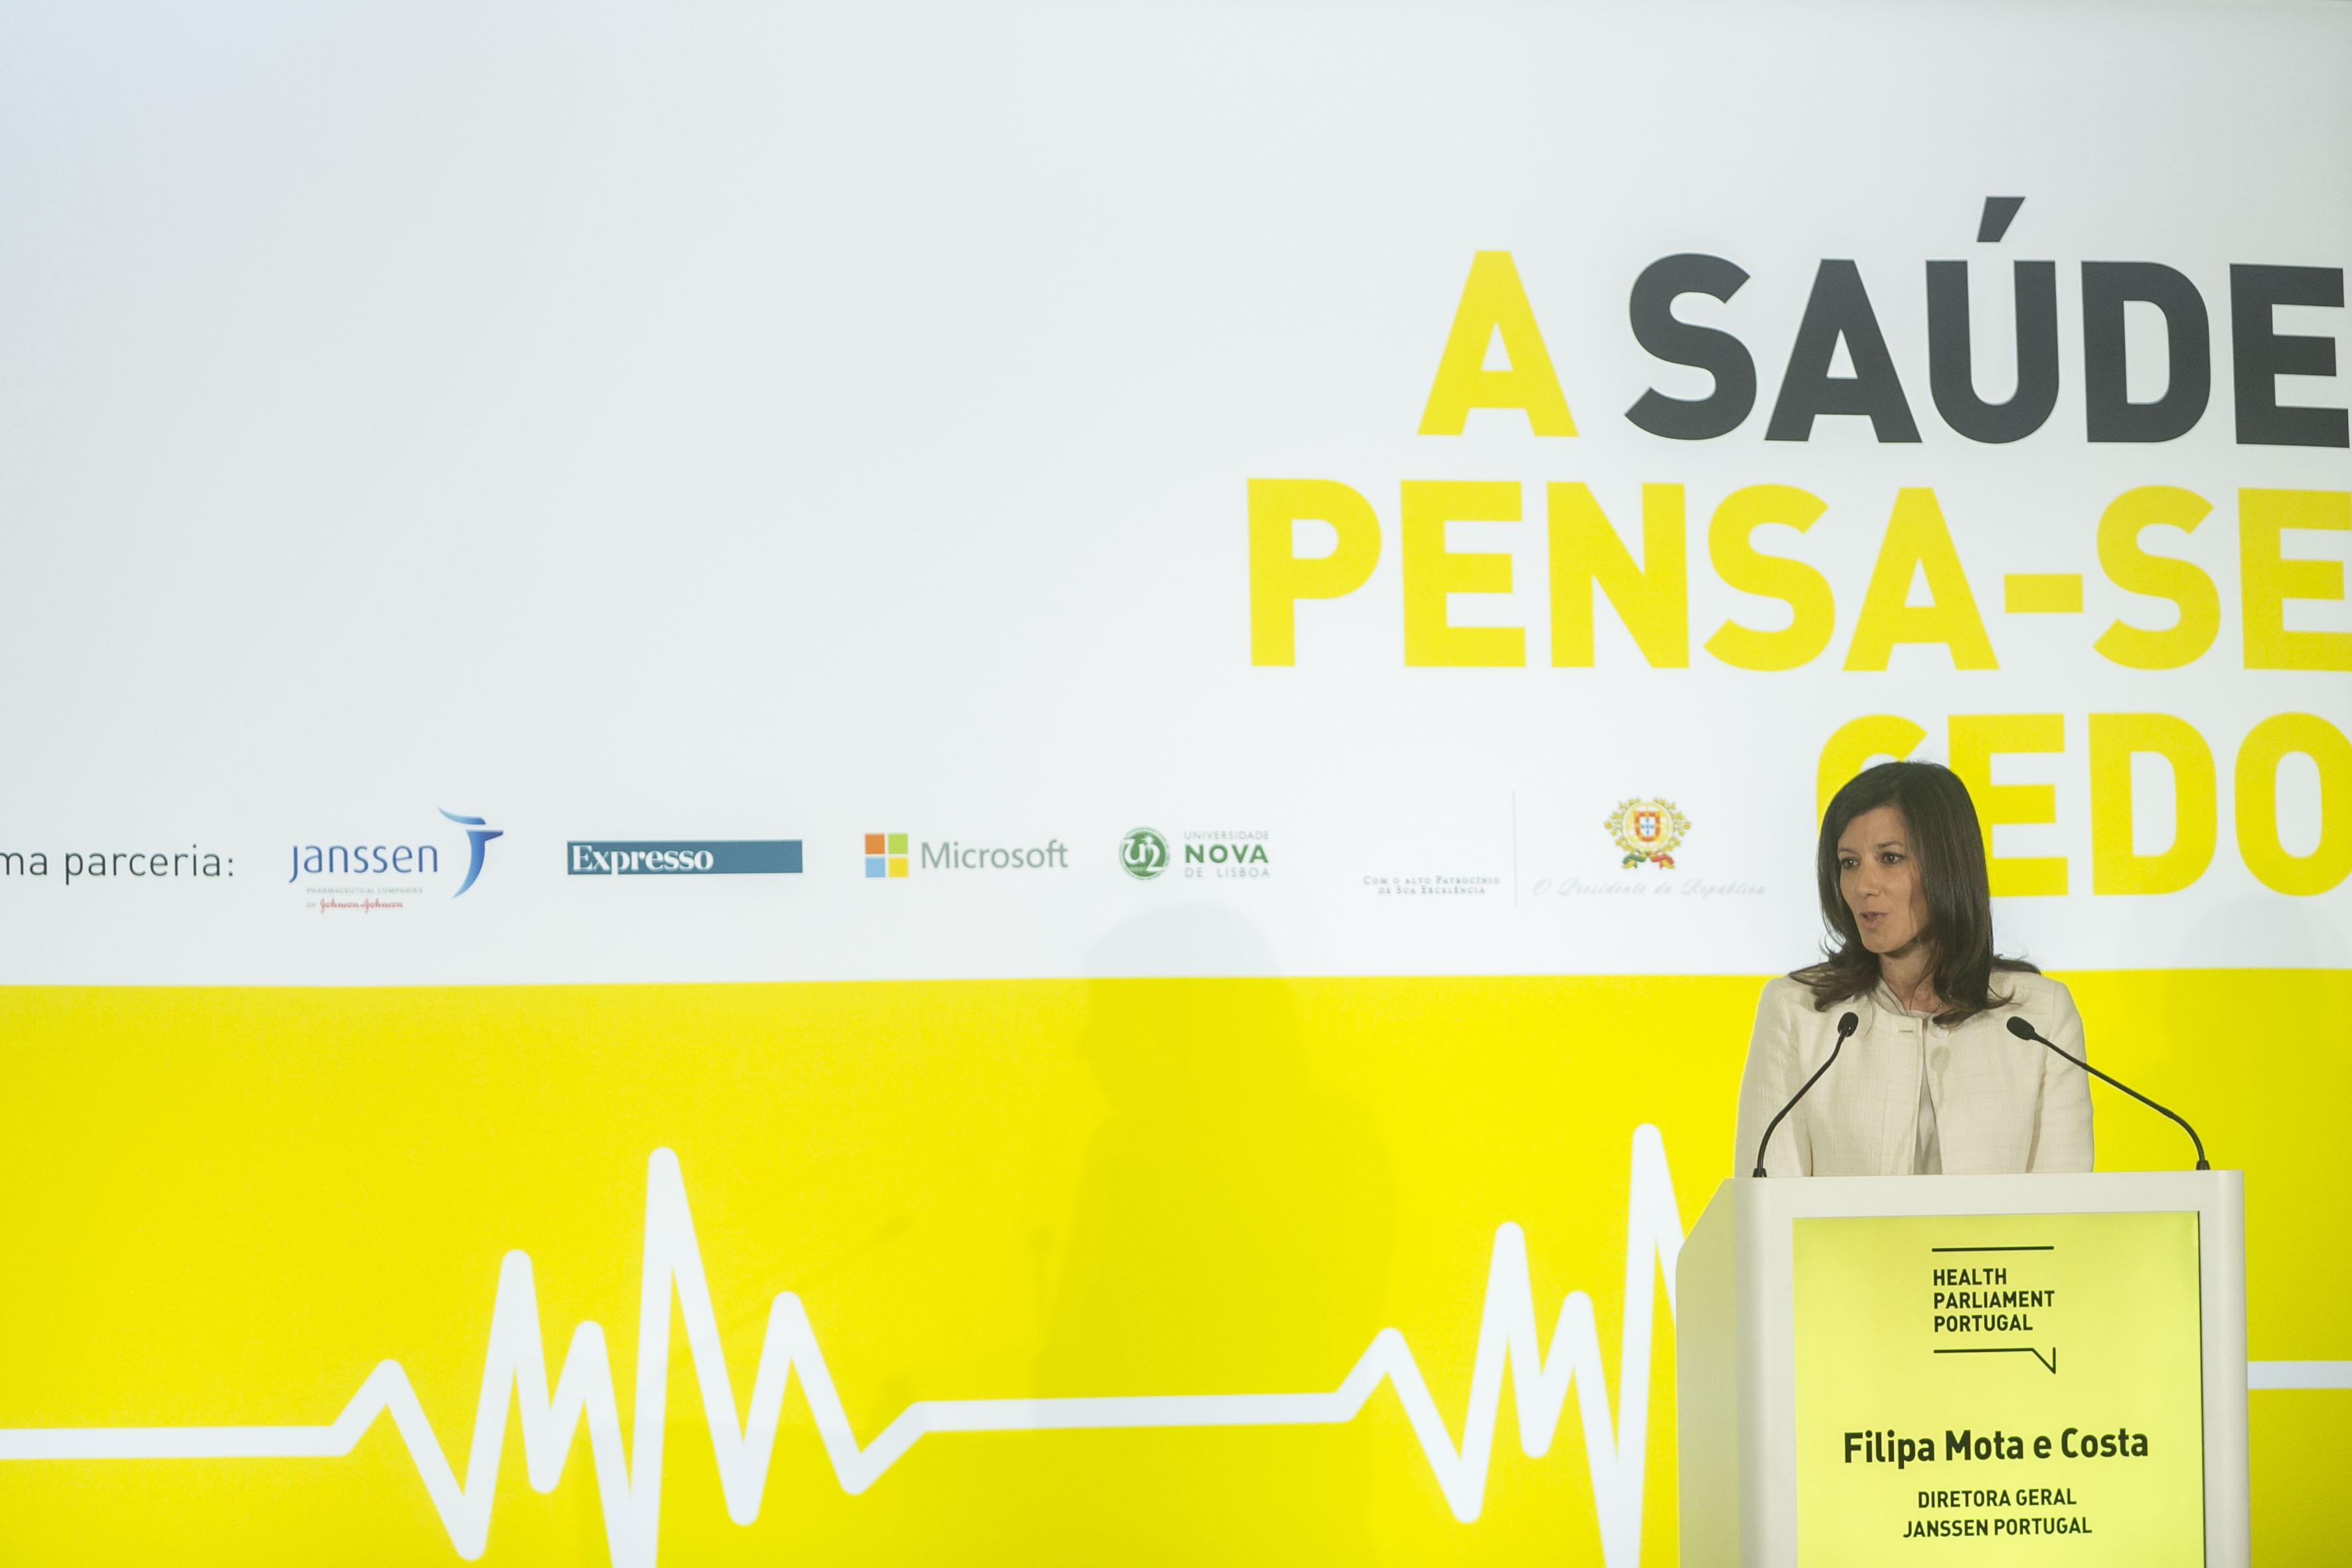 Filipa Costa, diretora-geral da Janssen Portugal, no discurso de abertura.